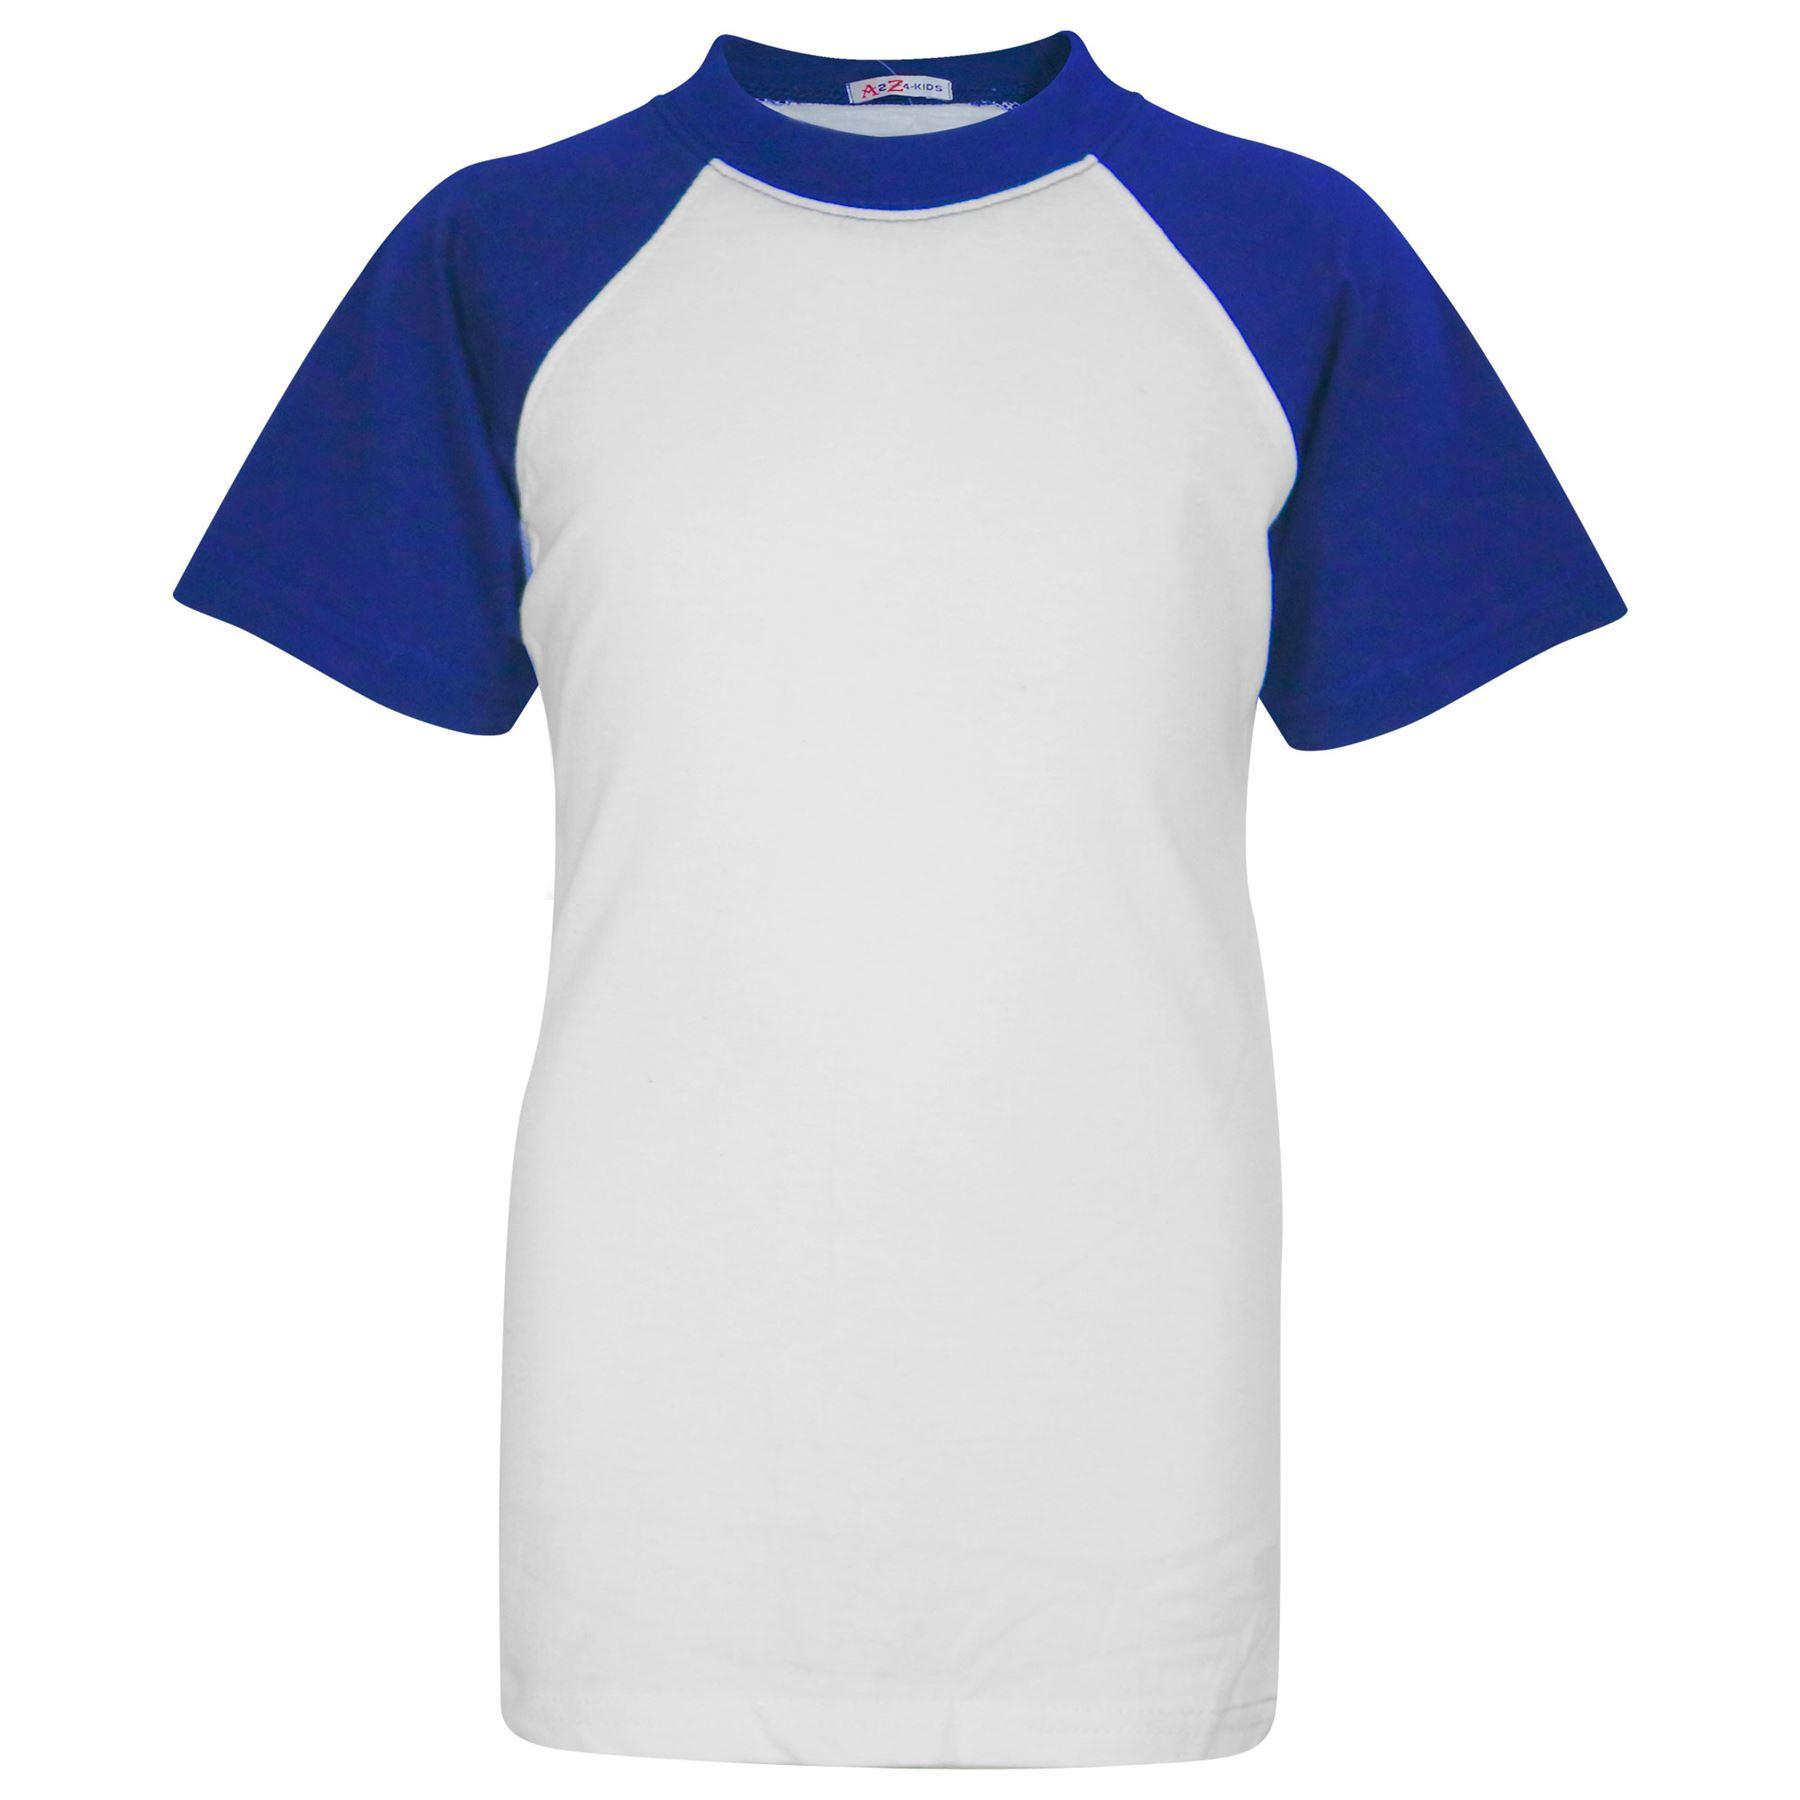 Enfants Garçons Filles T Shirt Plain Baseball court manches raglan Sports T-shirt 2-13Y